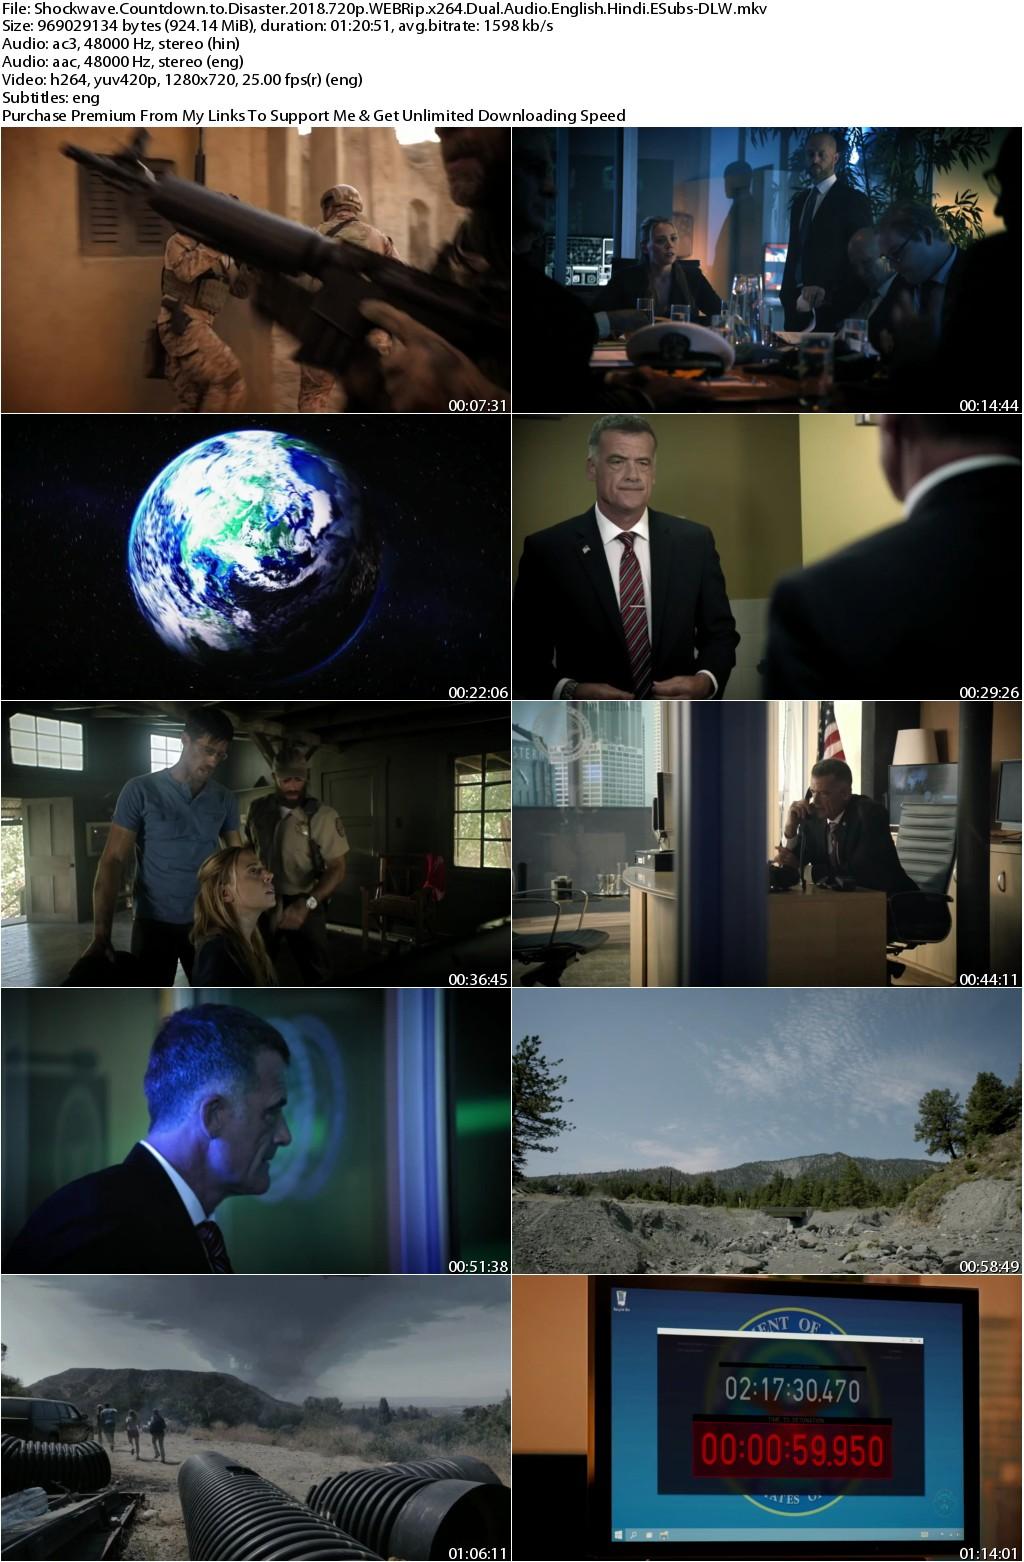 Shockwave Countdown to Disaster (2018) 720p WEBRip x264 Dual Audio English Hindi ESubs-DLW